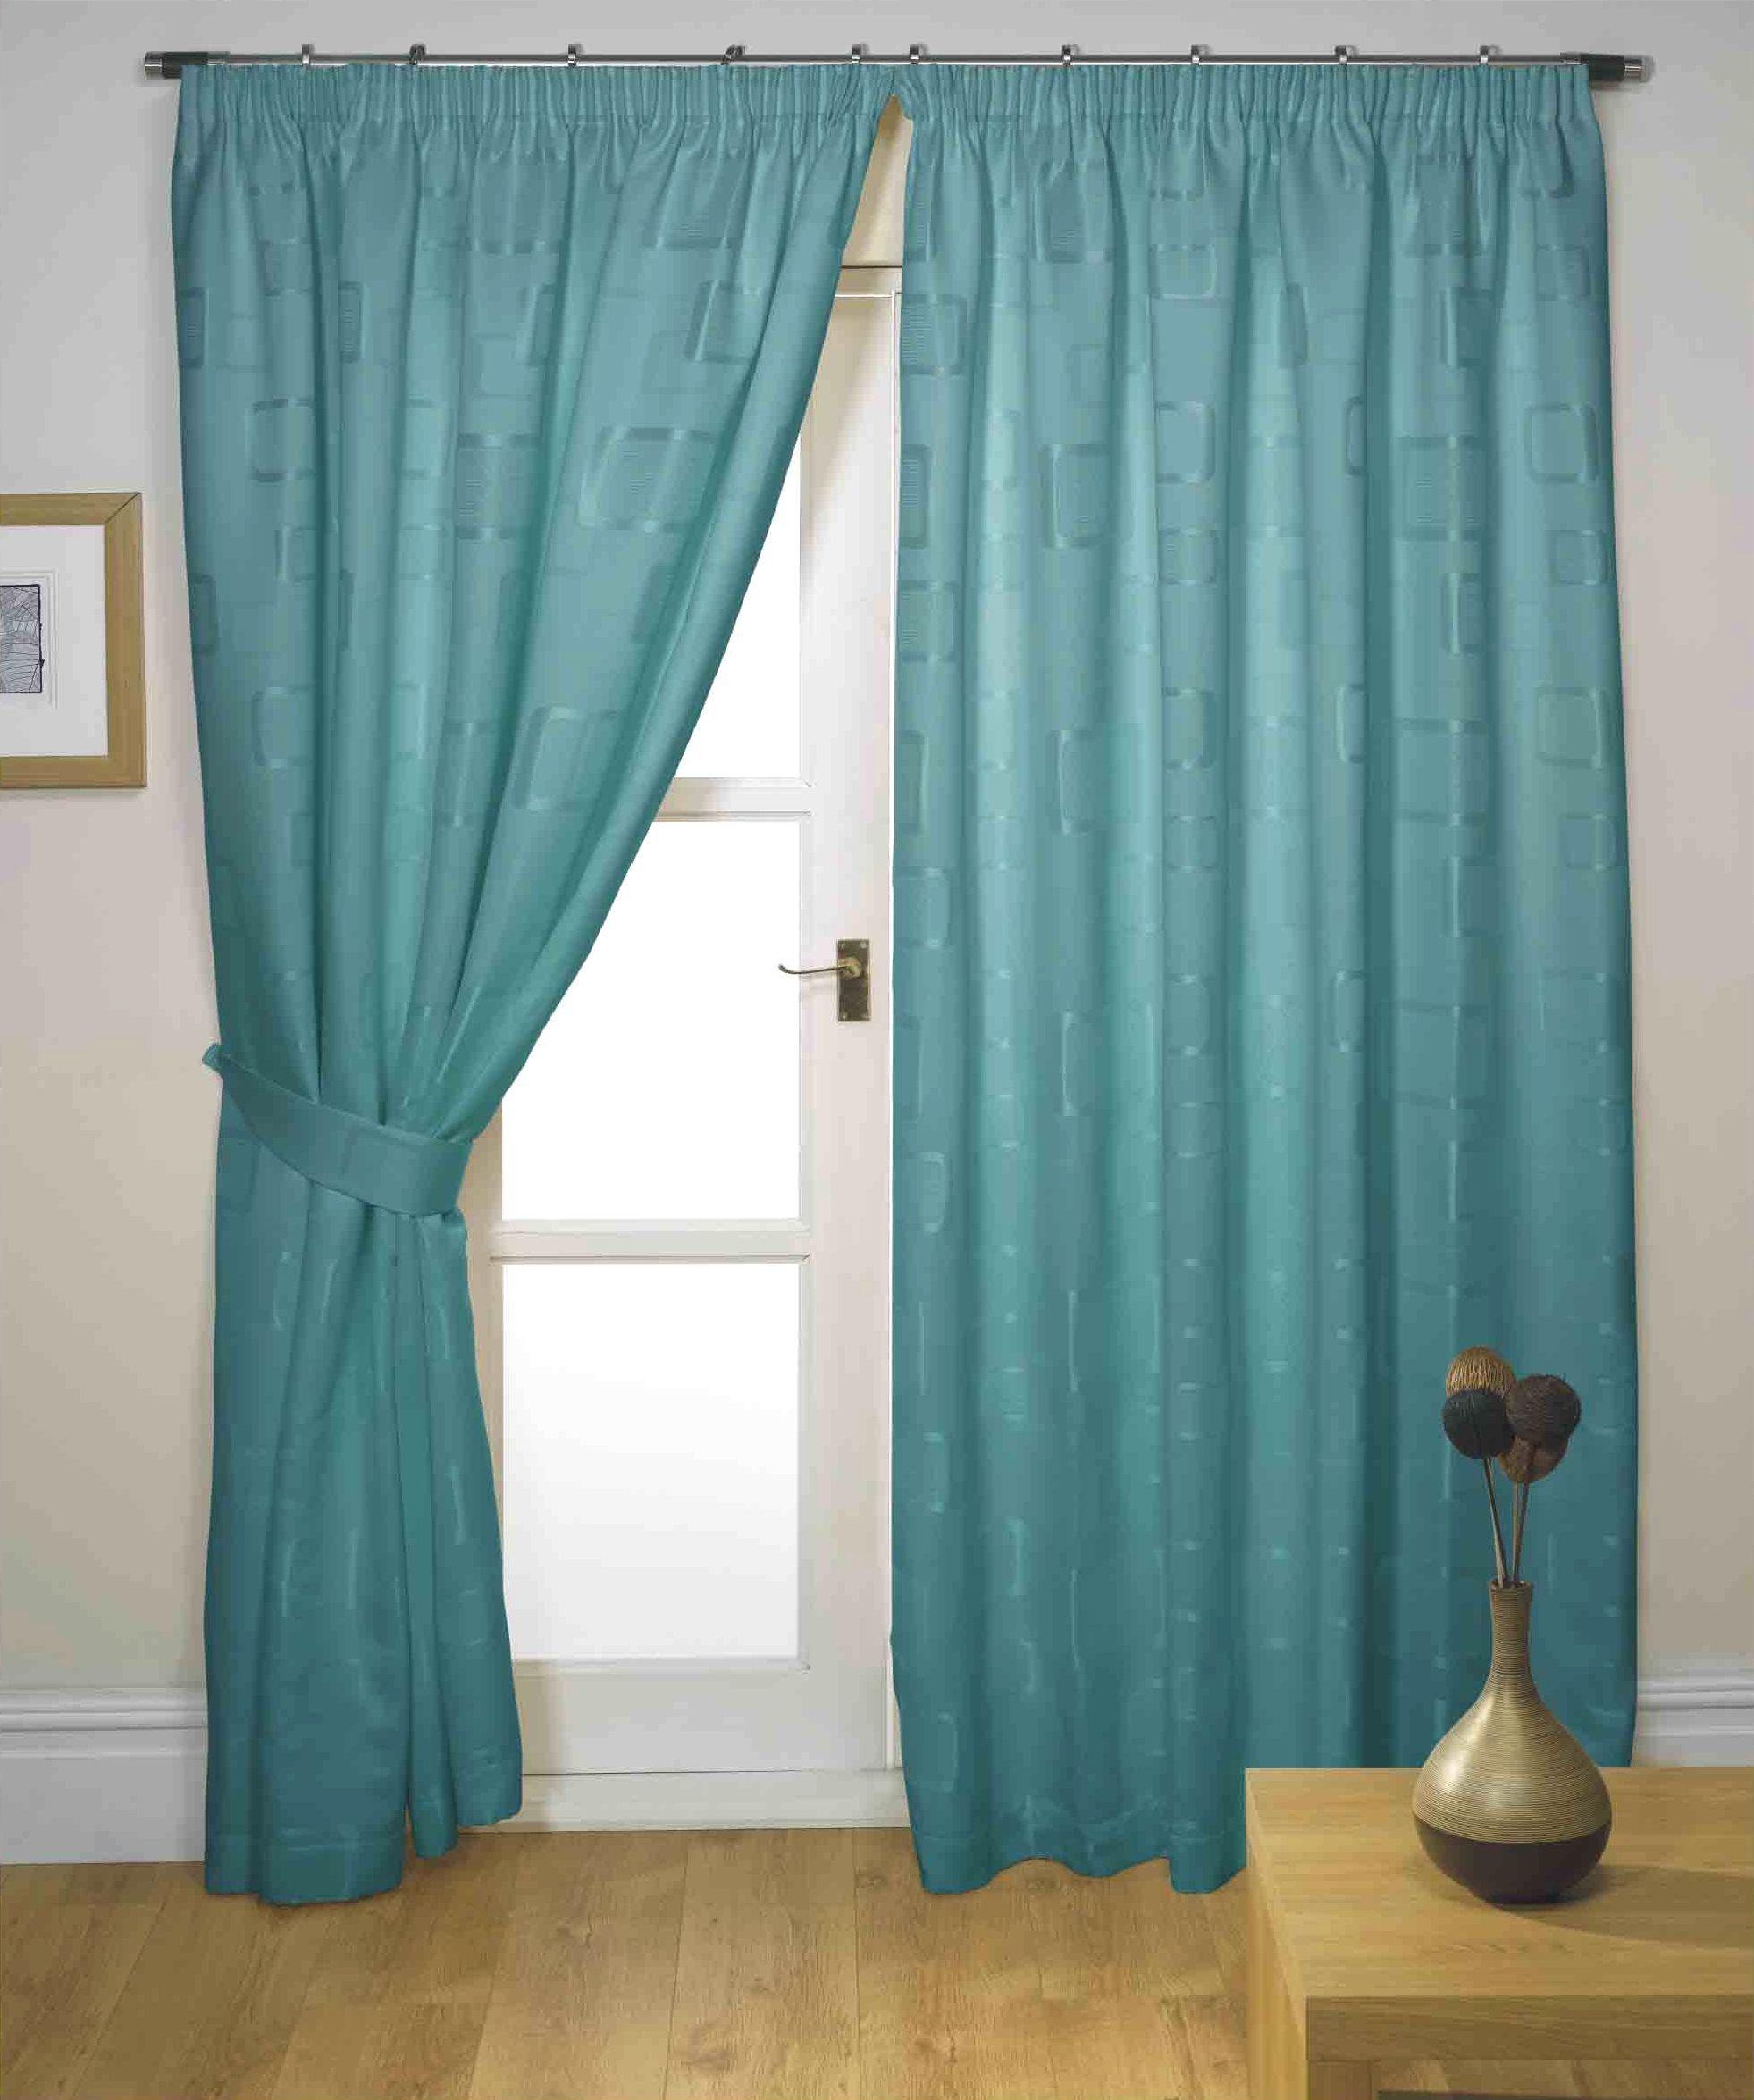 cortinas ya hechas cinta superior verde azulado 66 x 90 de